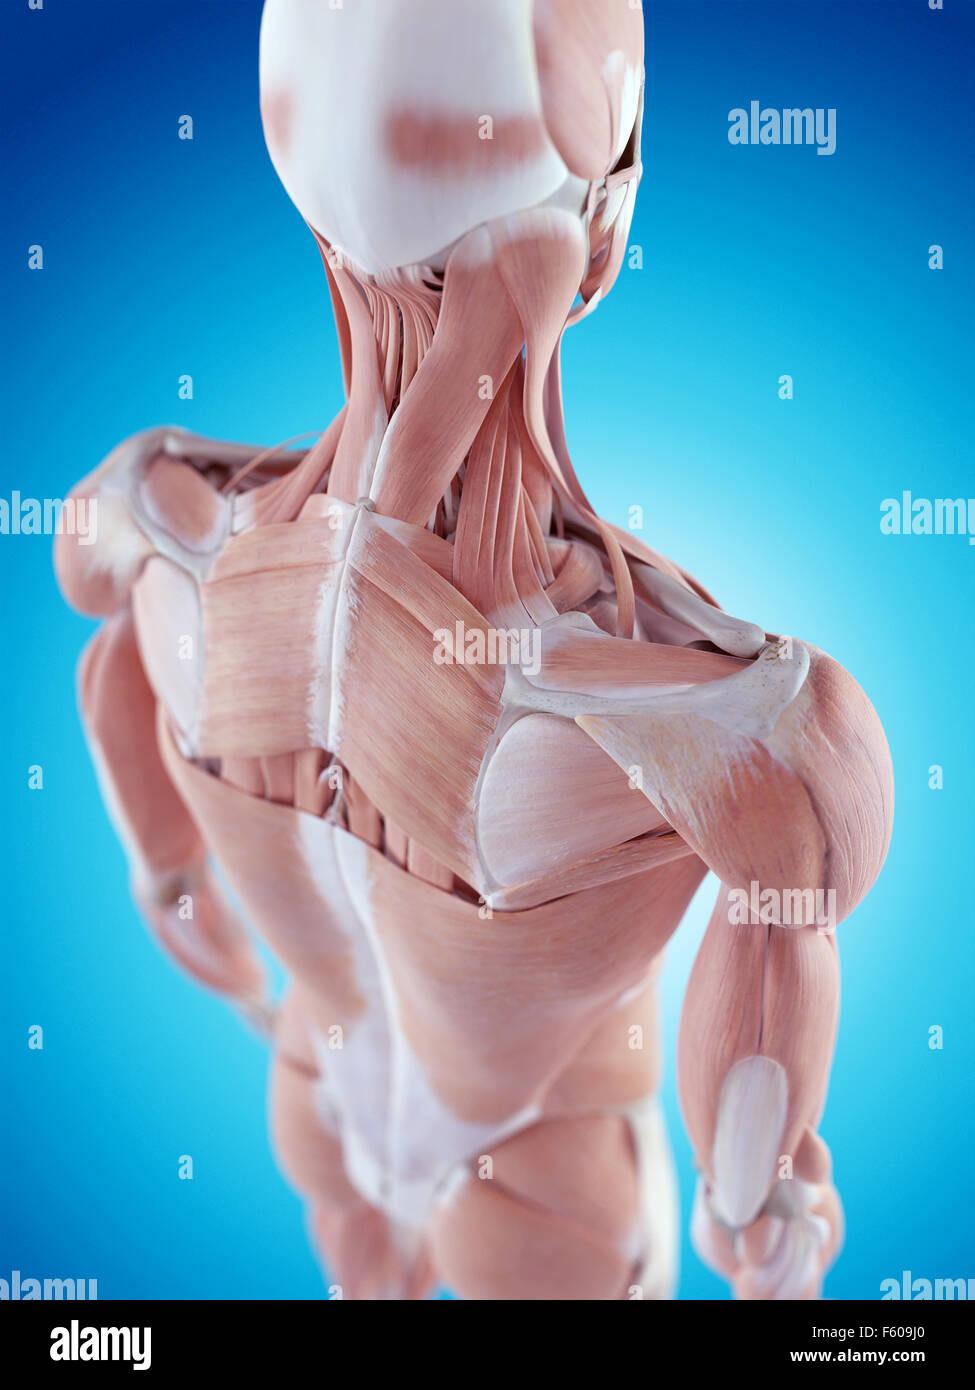 Rhomboid Muscle Stockfotos & Rhomboid Muscle Bilder - Alamy